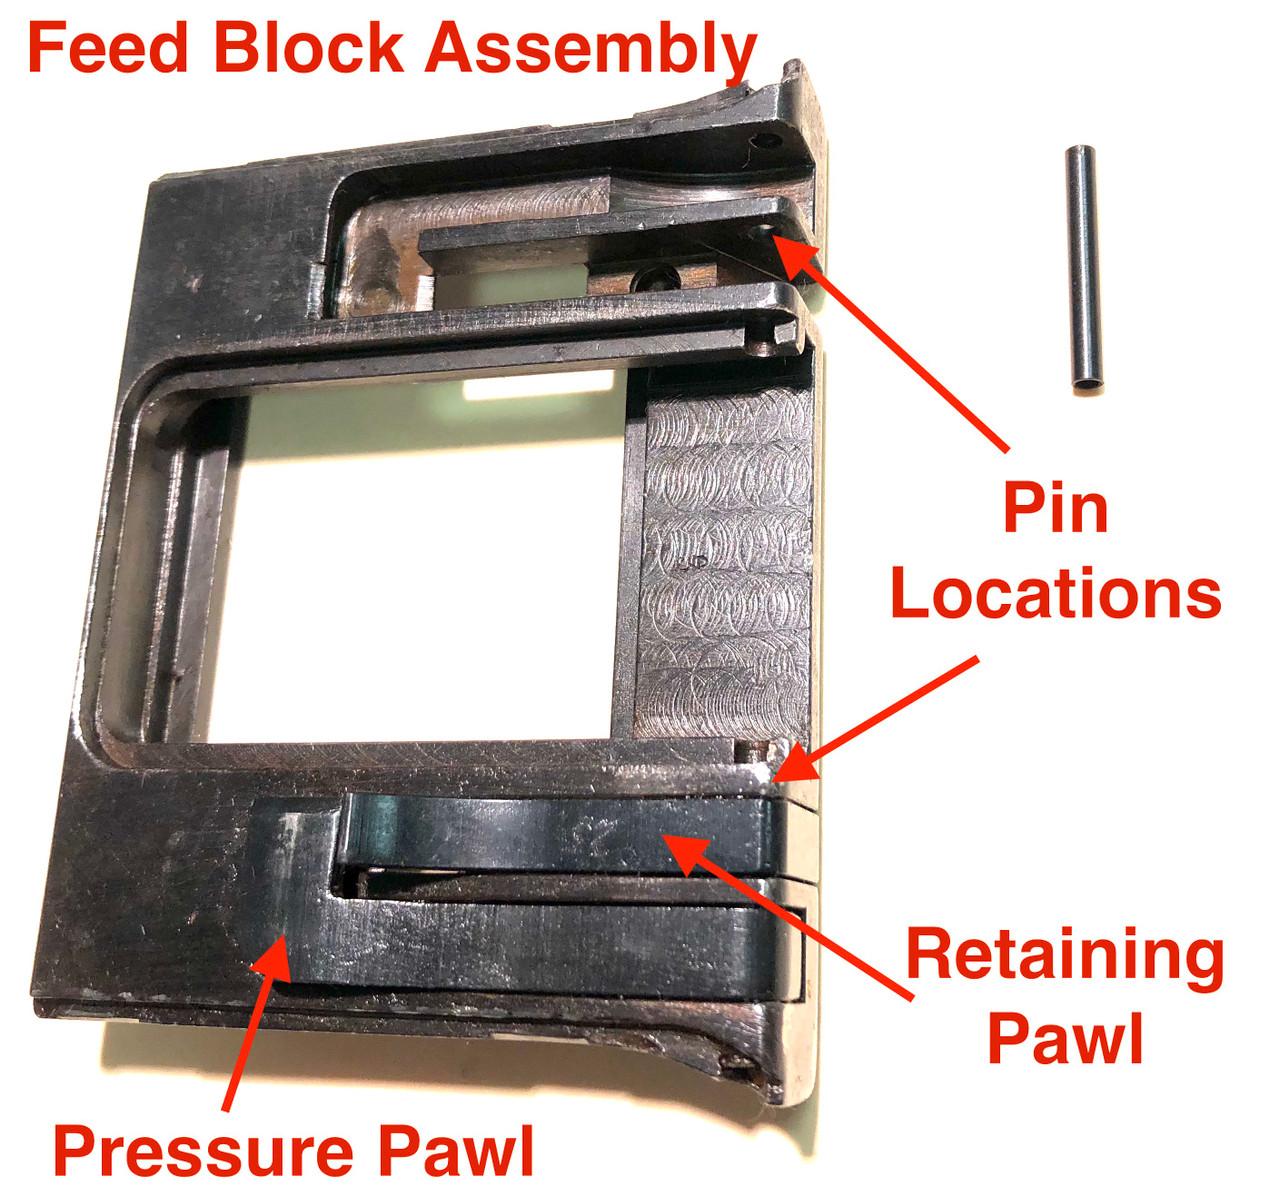 MG34 Top Cover Feed Block Pin